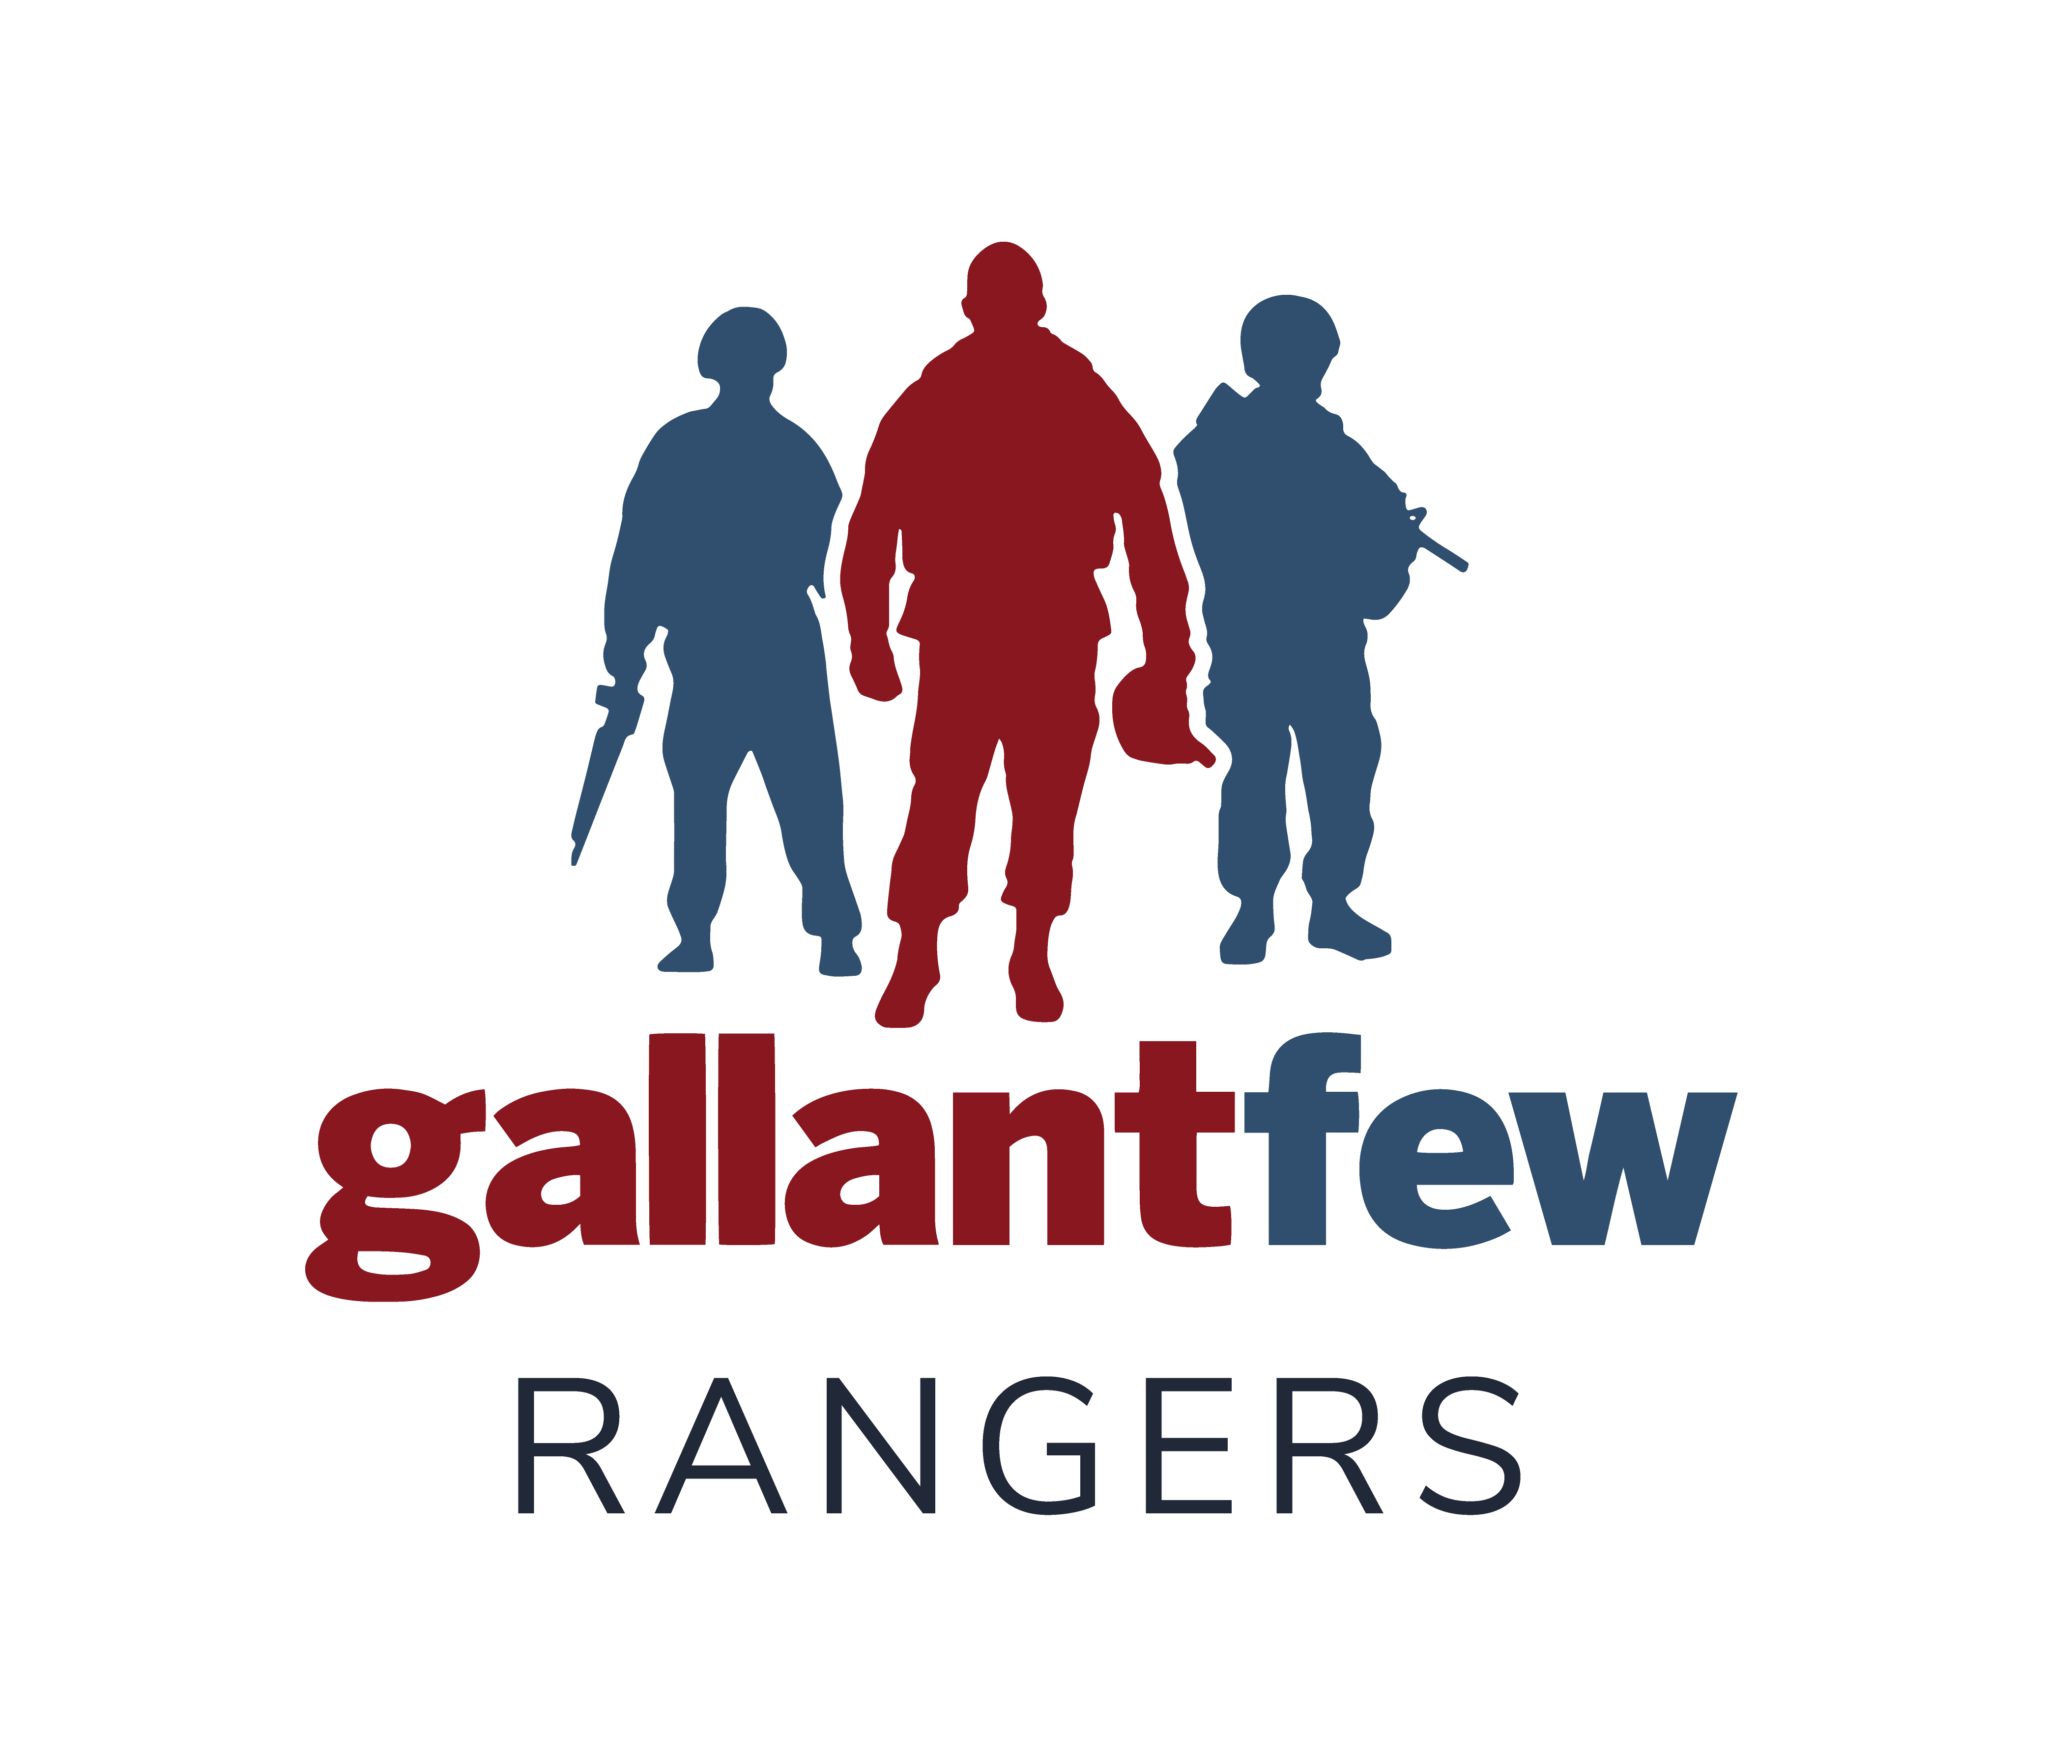 GallantFew Rangers logo